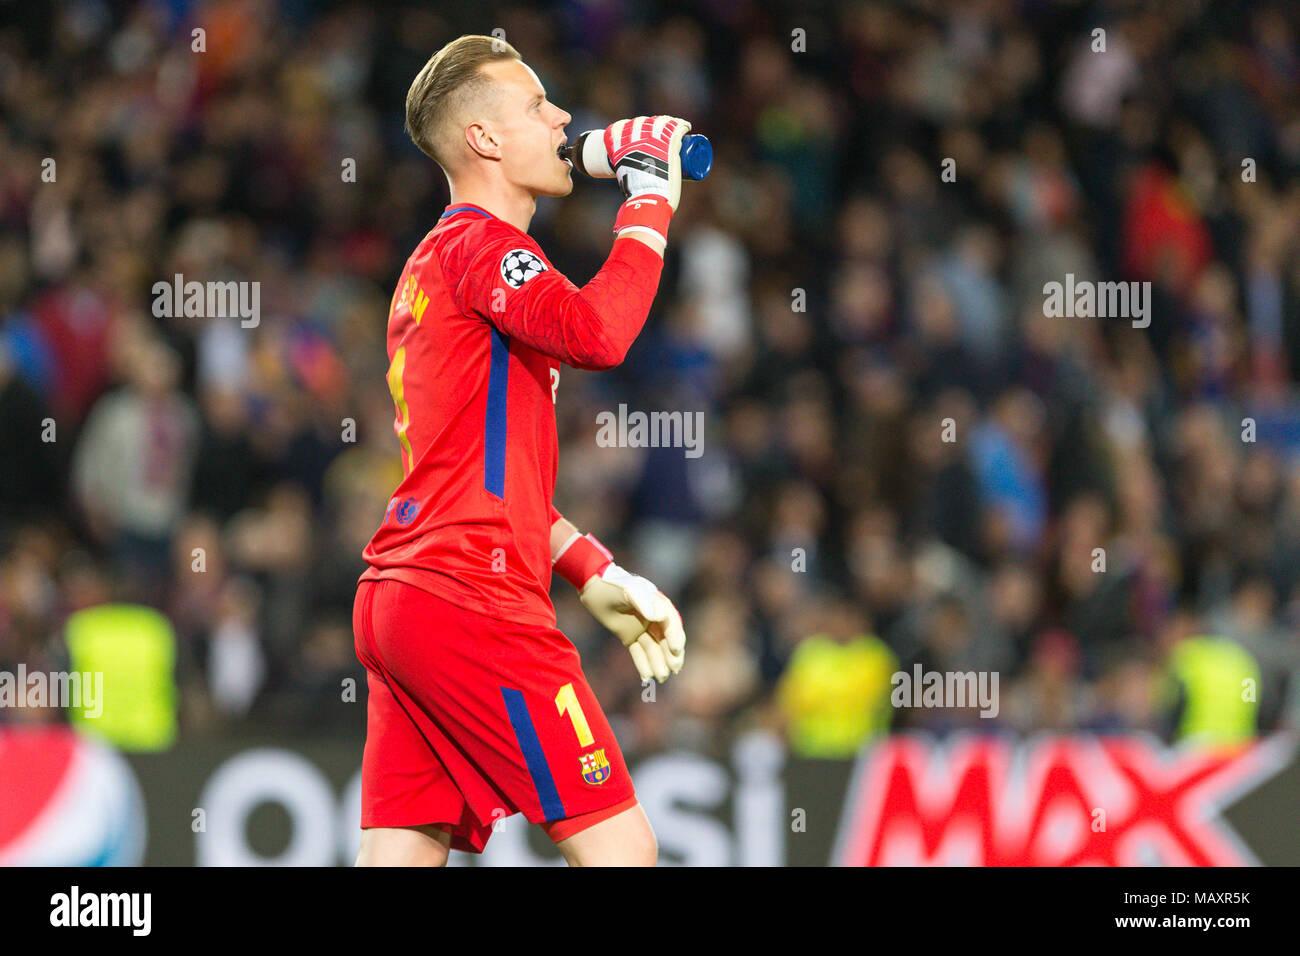 4a61e35c2 FC Barcelona goalkeeper Marc-Andre ter Stegen (1) during the UEFA Champions  League match between FC ...